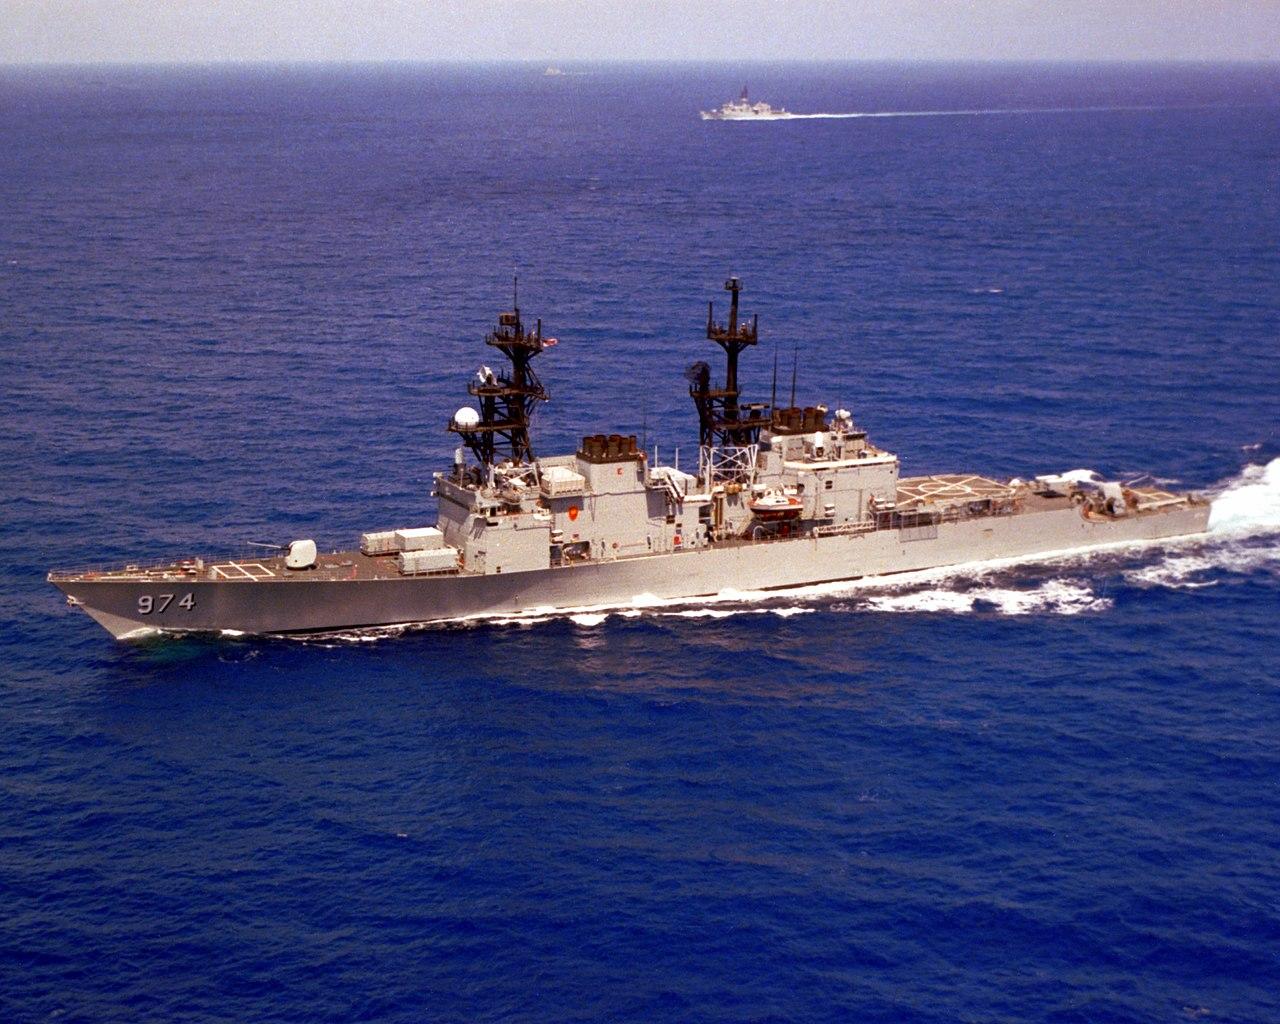 1280px-USS_Comte_de_Grasse_(DD-974)_underway_in_the_Indian_Ocean_on_17_June_1987_(6418448).jpeg